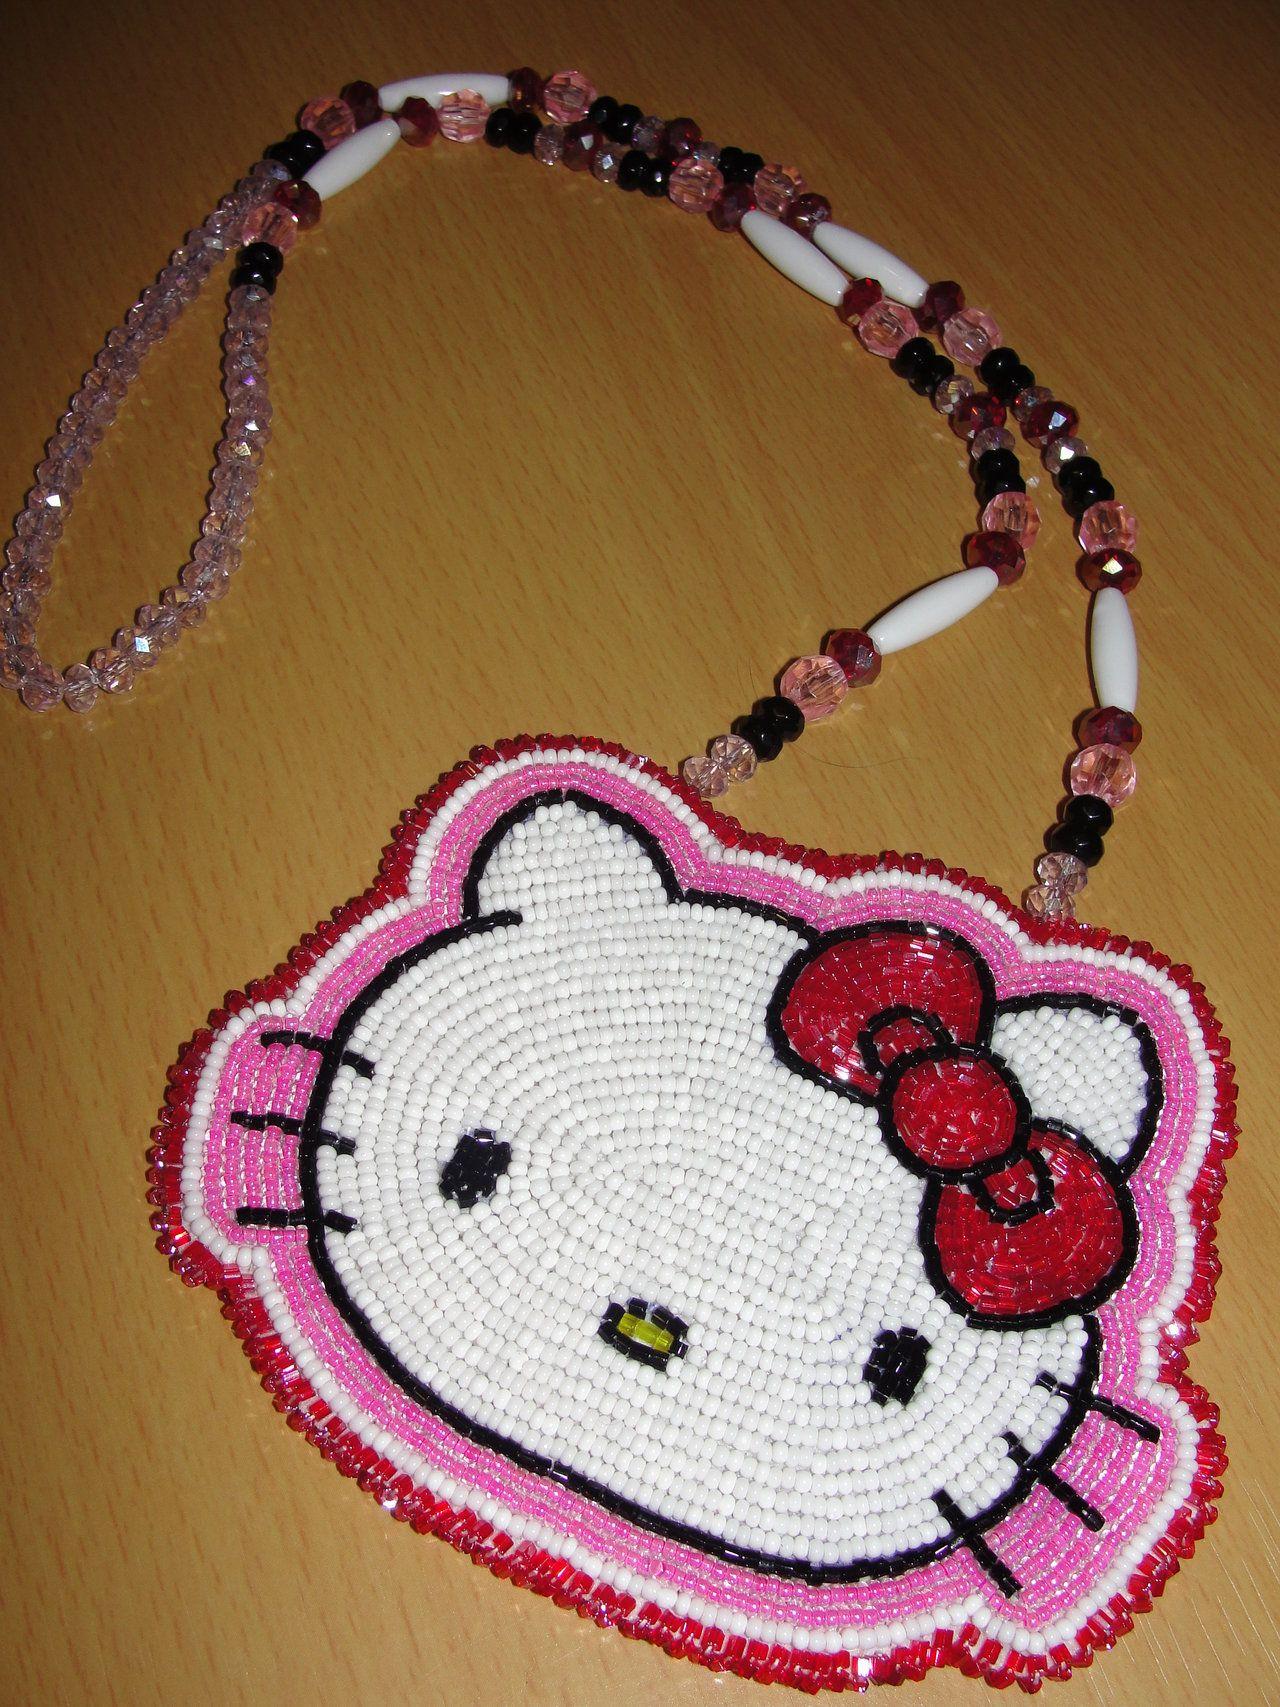 bd1b230ca Hello Kitty Medallion by Denial616.deviantart.com   Bead work ...